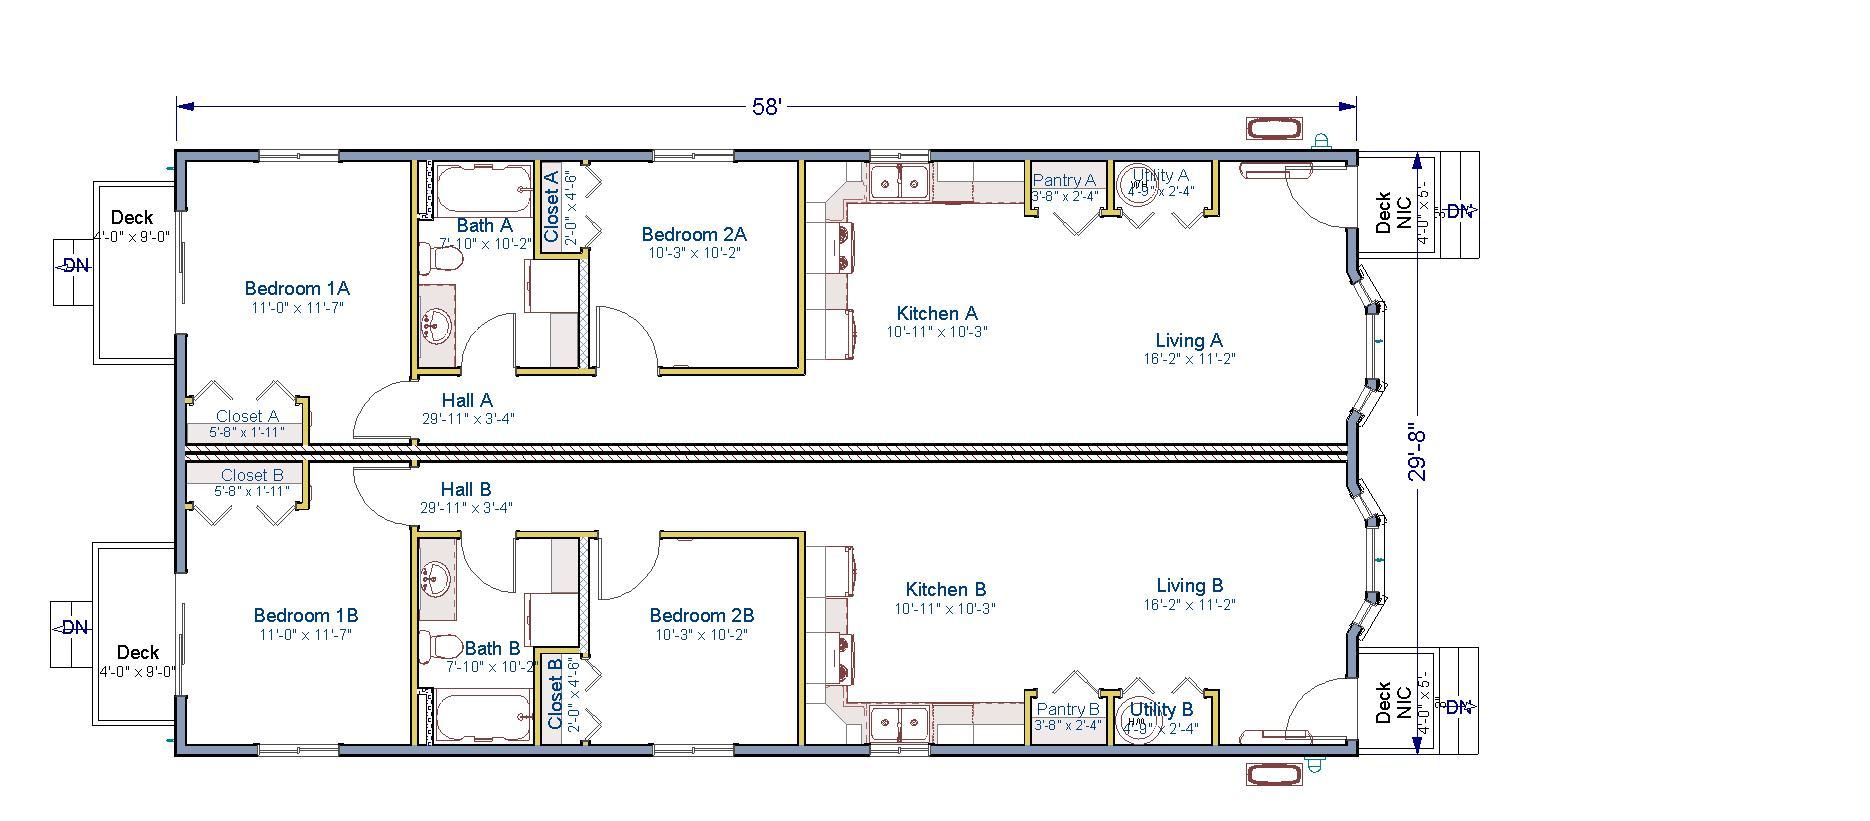 30x58 Duplex Tlc Modular Homes